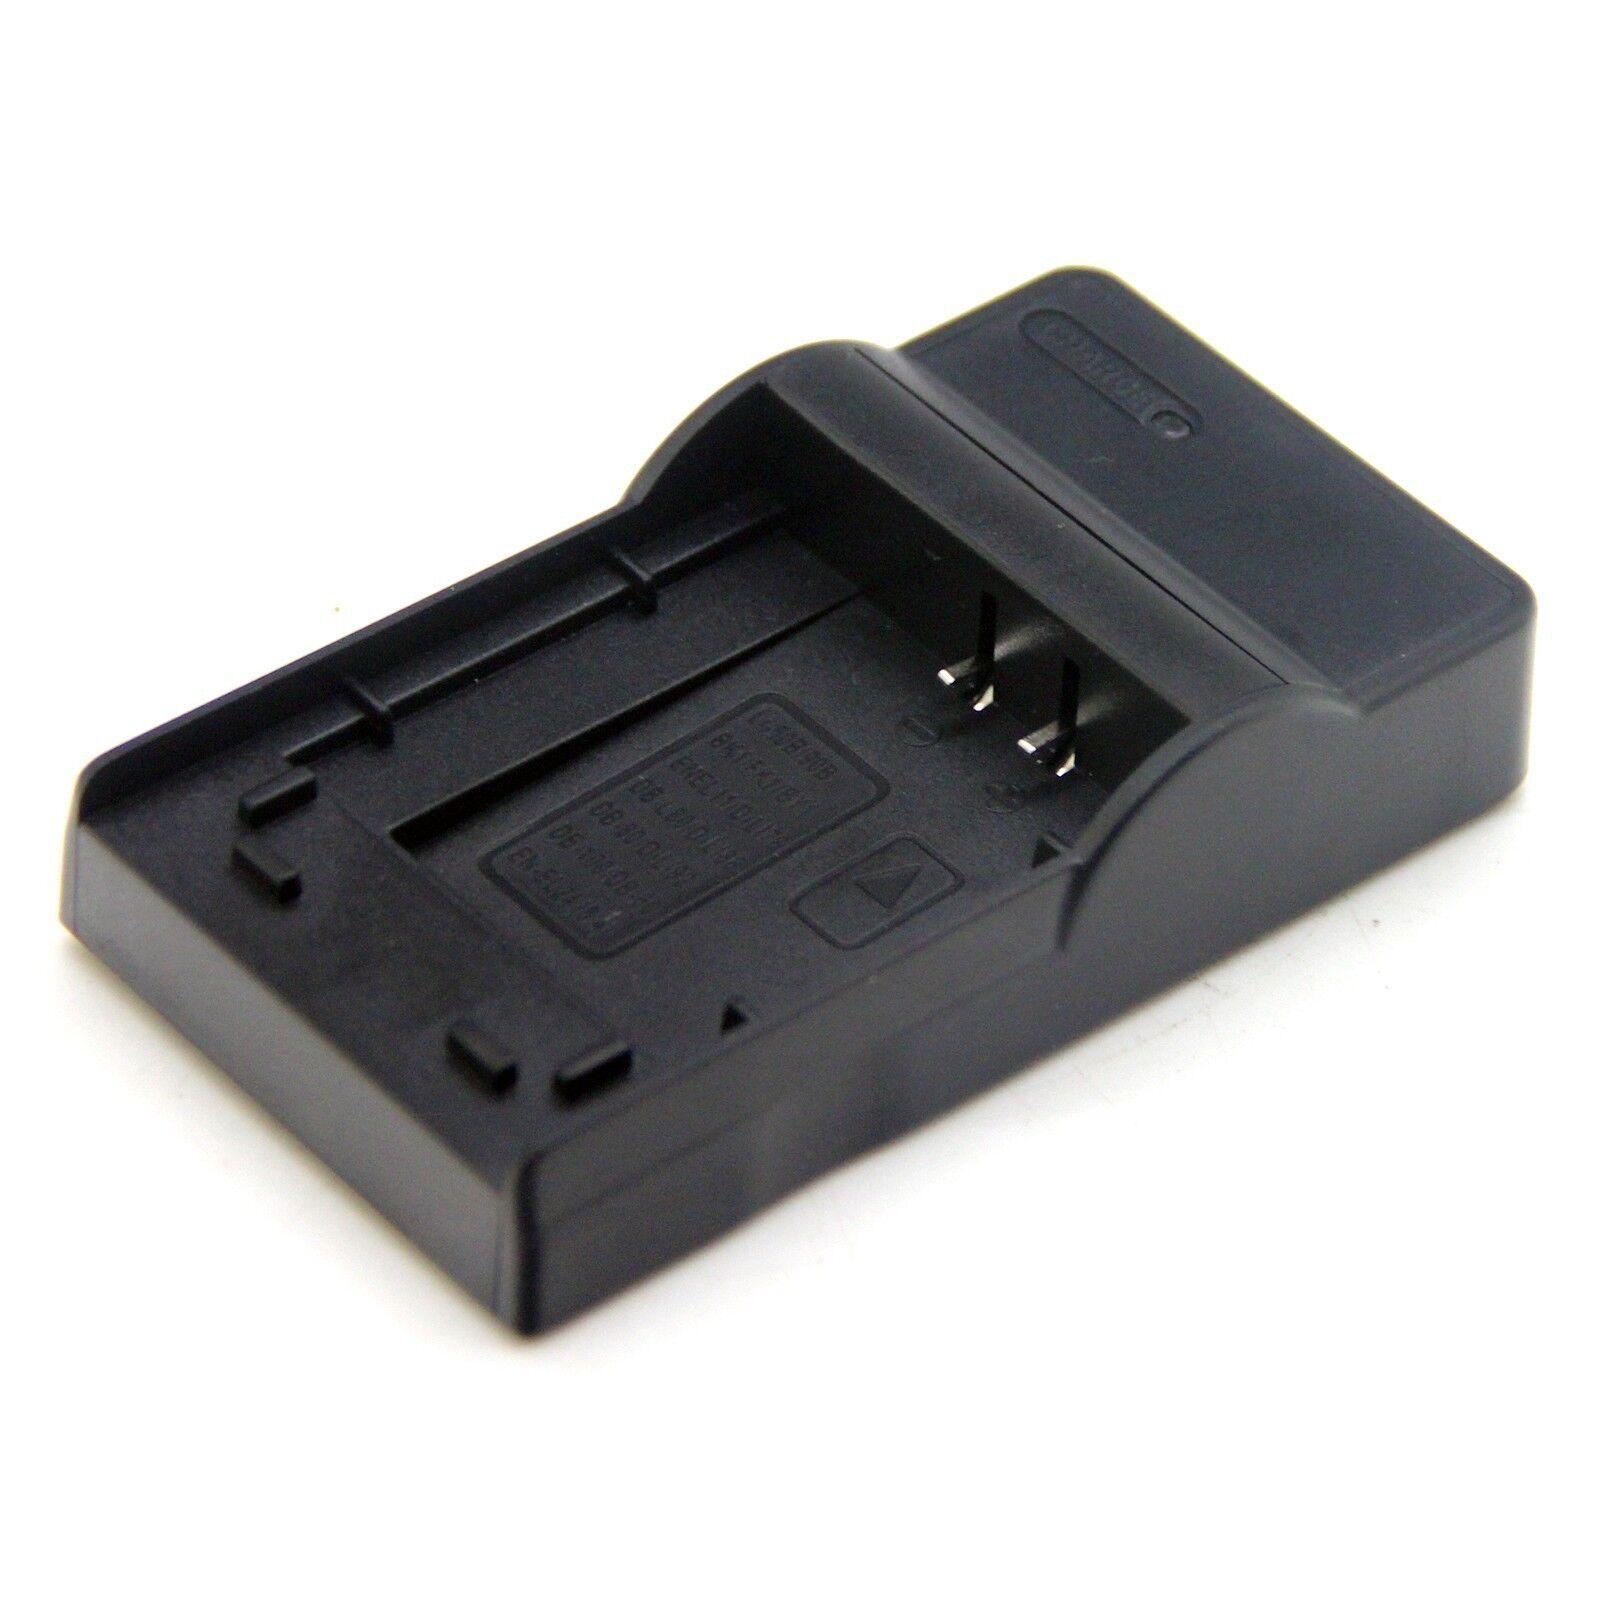 GR-DVL9000U Replacement for JVC Camera Battery GR-DVL9000 GAXI Battery for JVC GR-DLS1U GR-DVL GR-DV9000